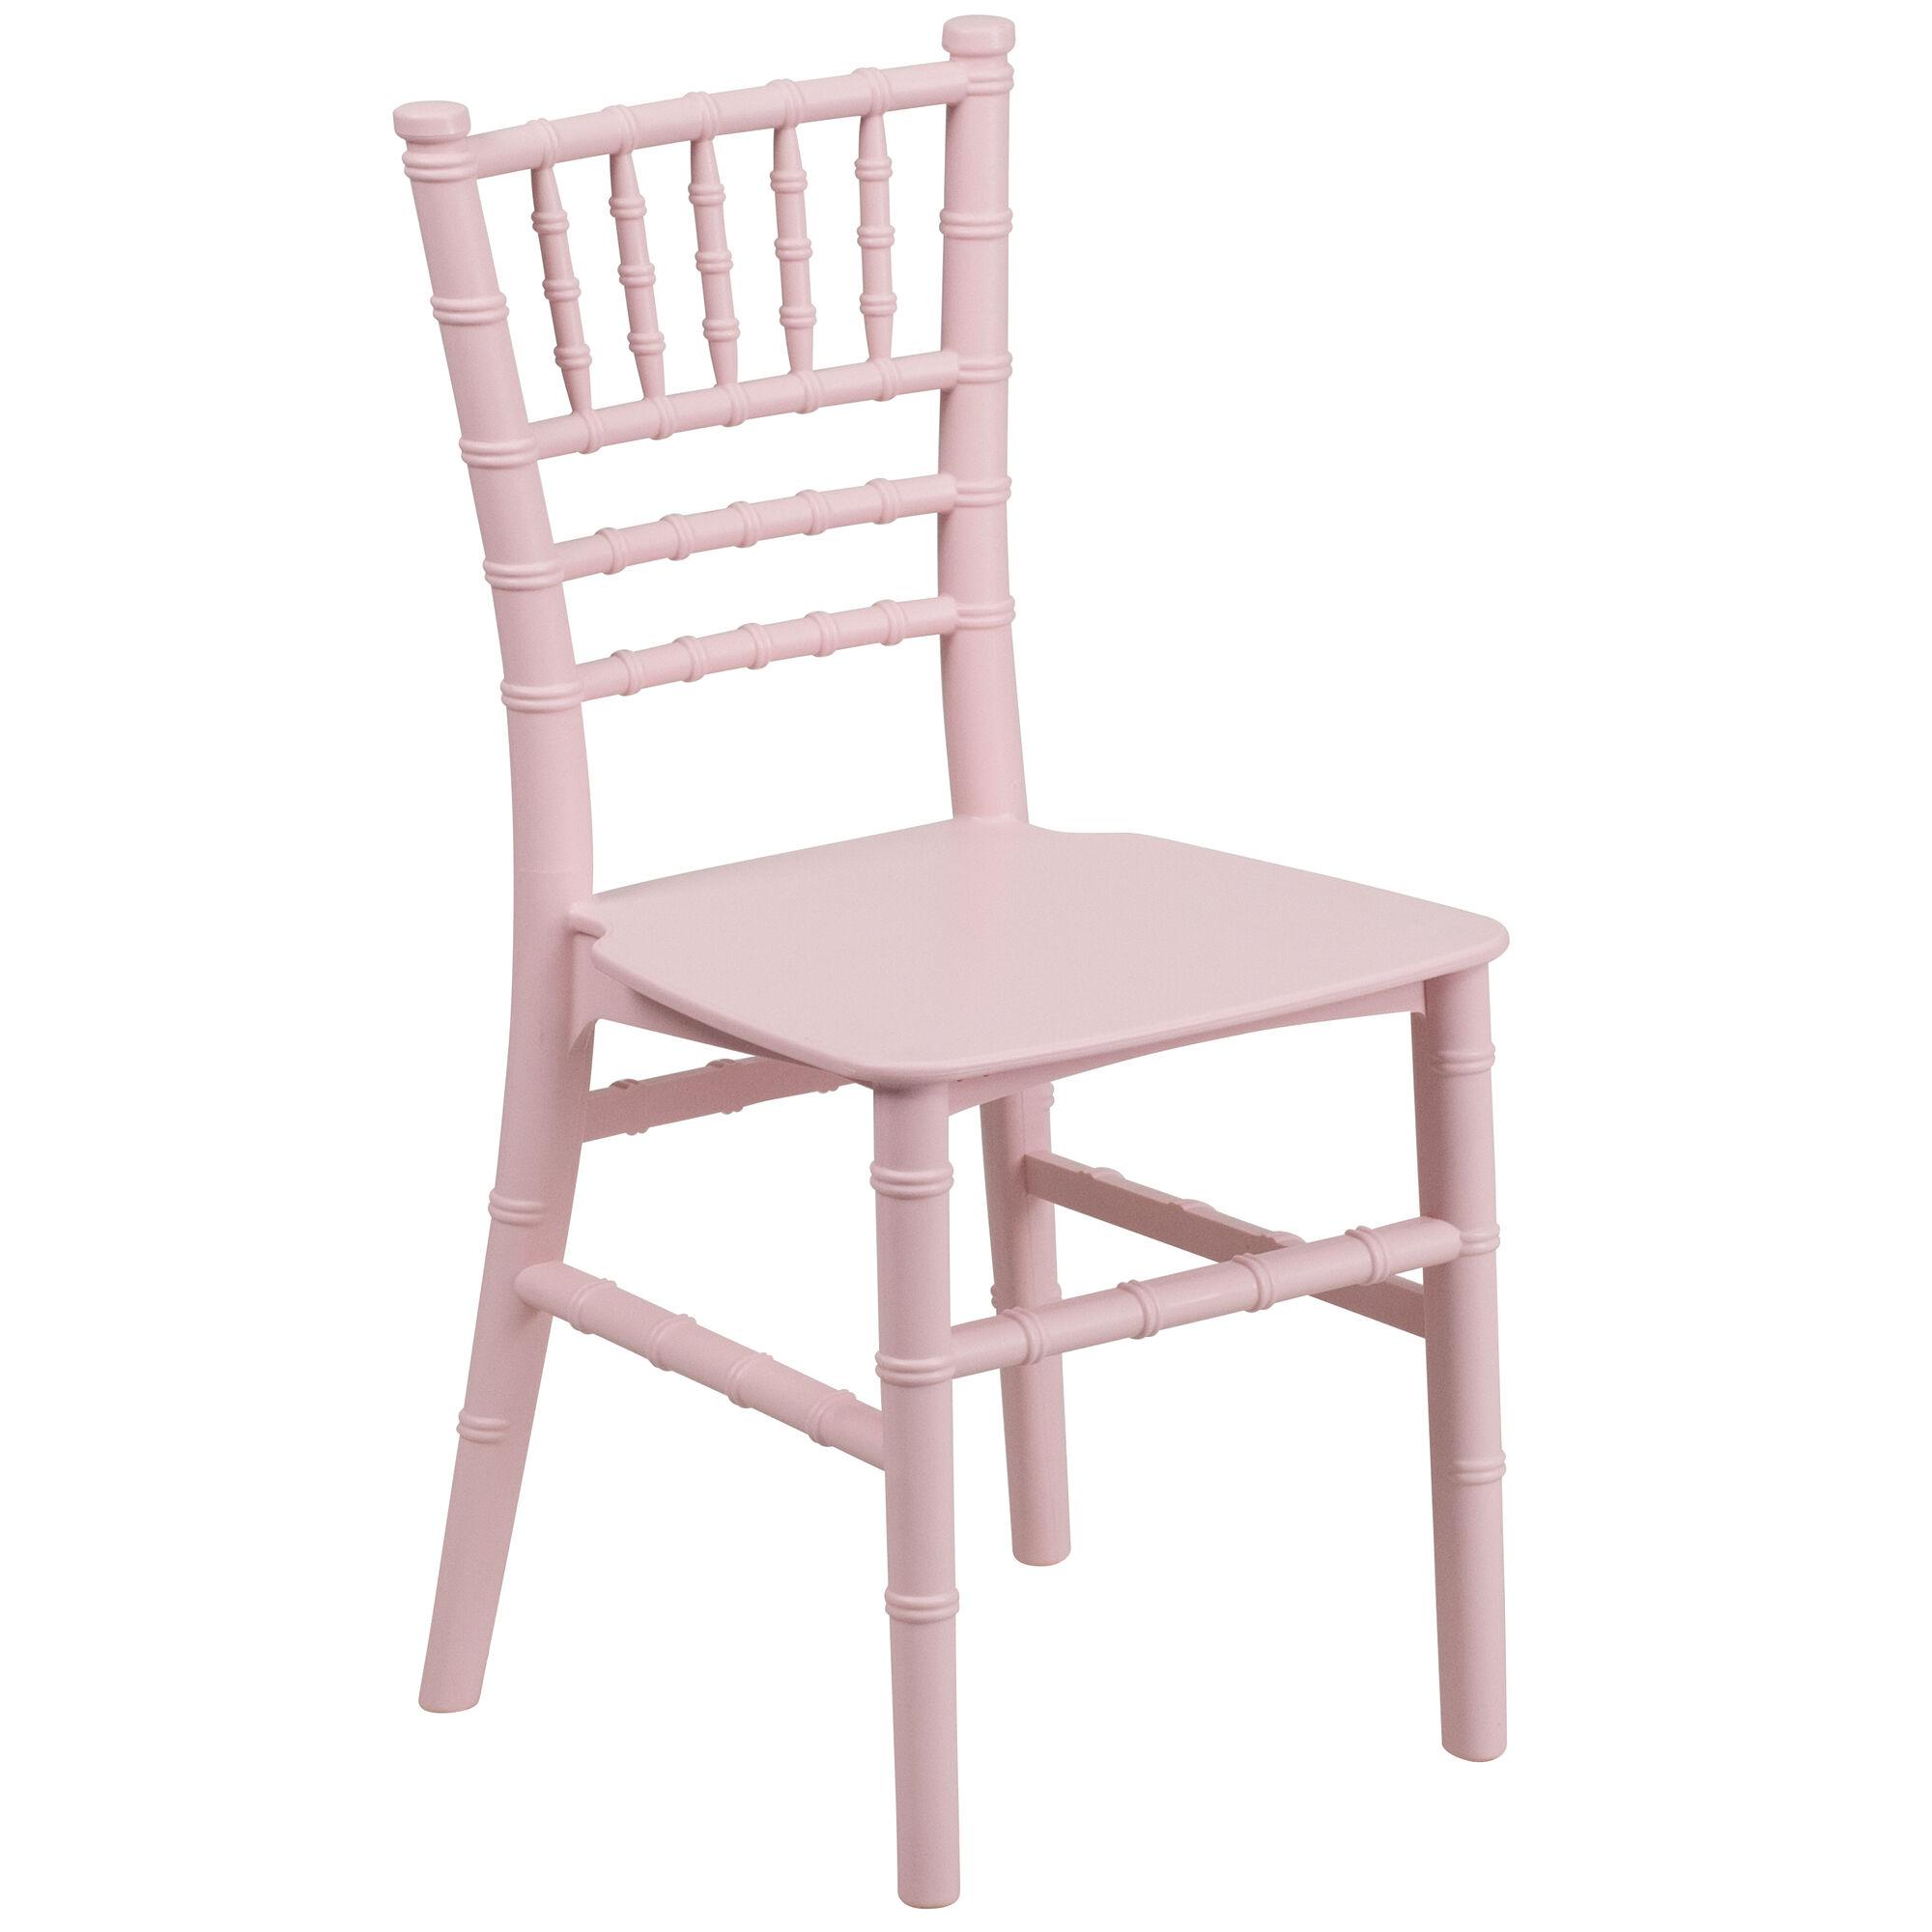 Cool Kids Pink Resin Chiavari Chair Andrewgaddart Wooden Chair Designs For Living Room Andrewgaddartcom